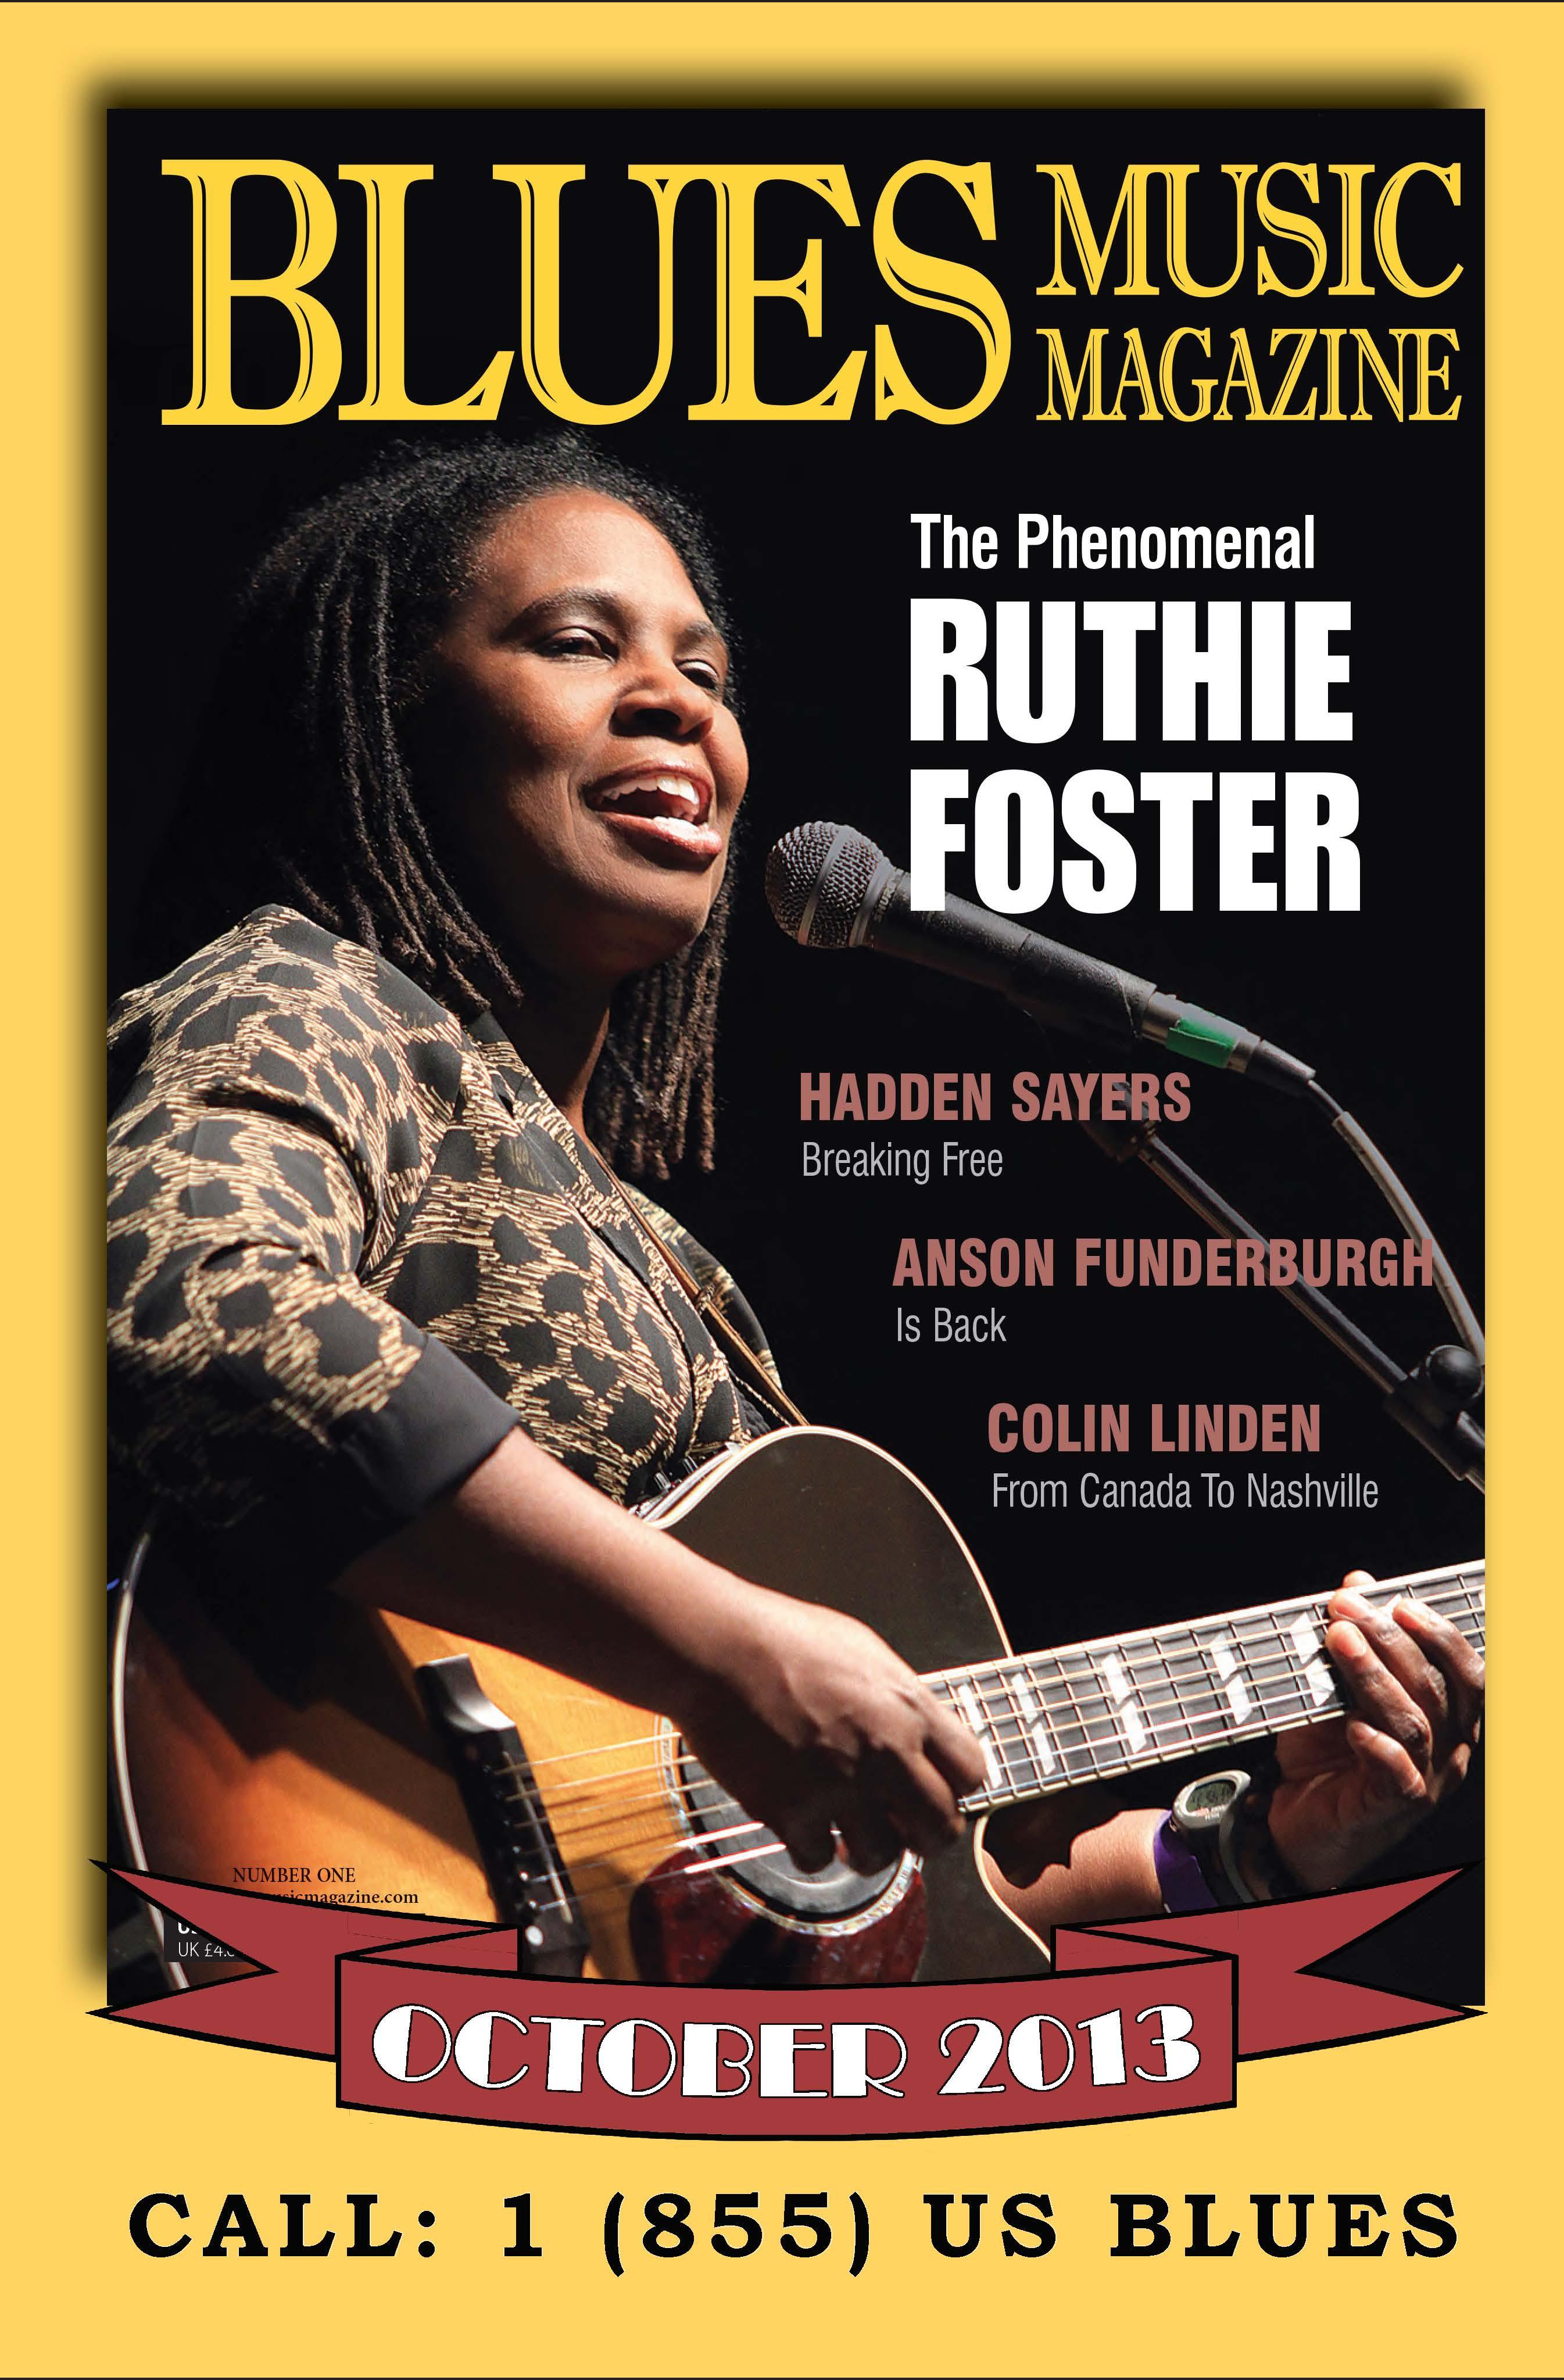 ruthie-foster-october-2013.jpg